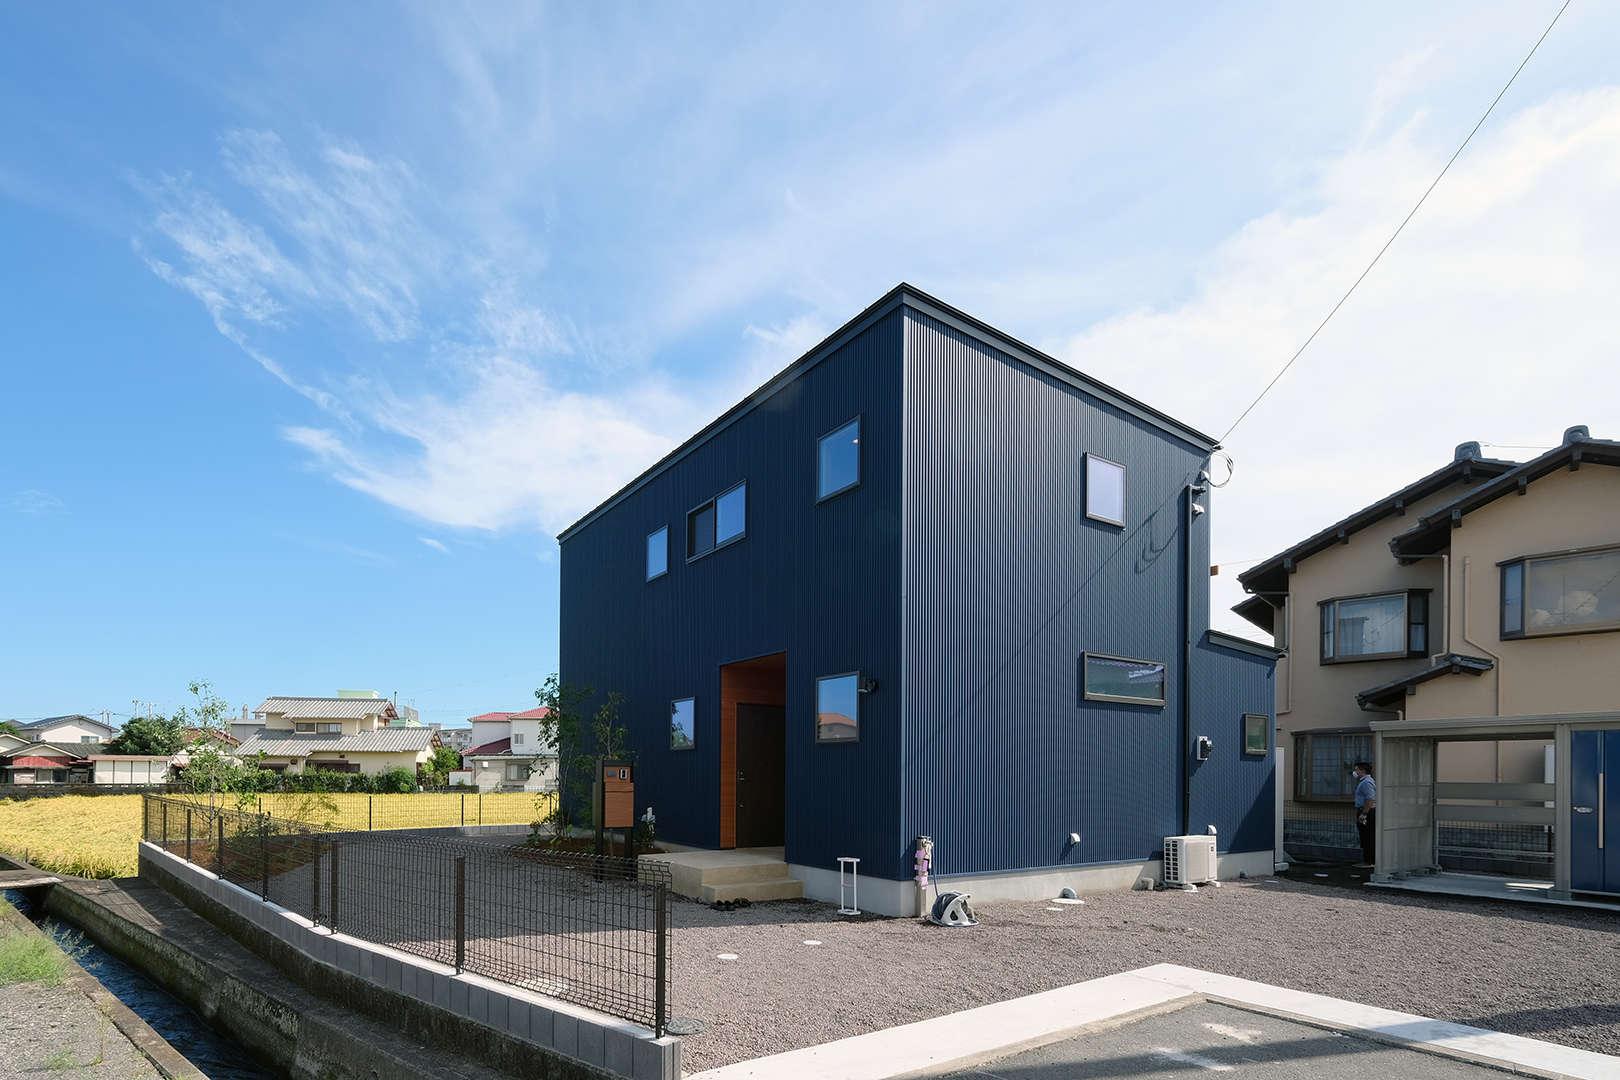 【R+house】スクエアな外観とリーディングヌック in富士市